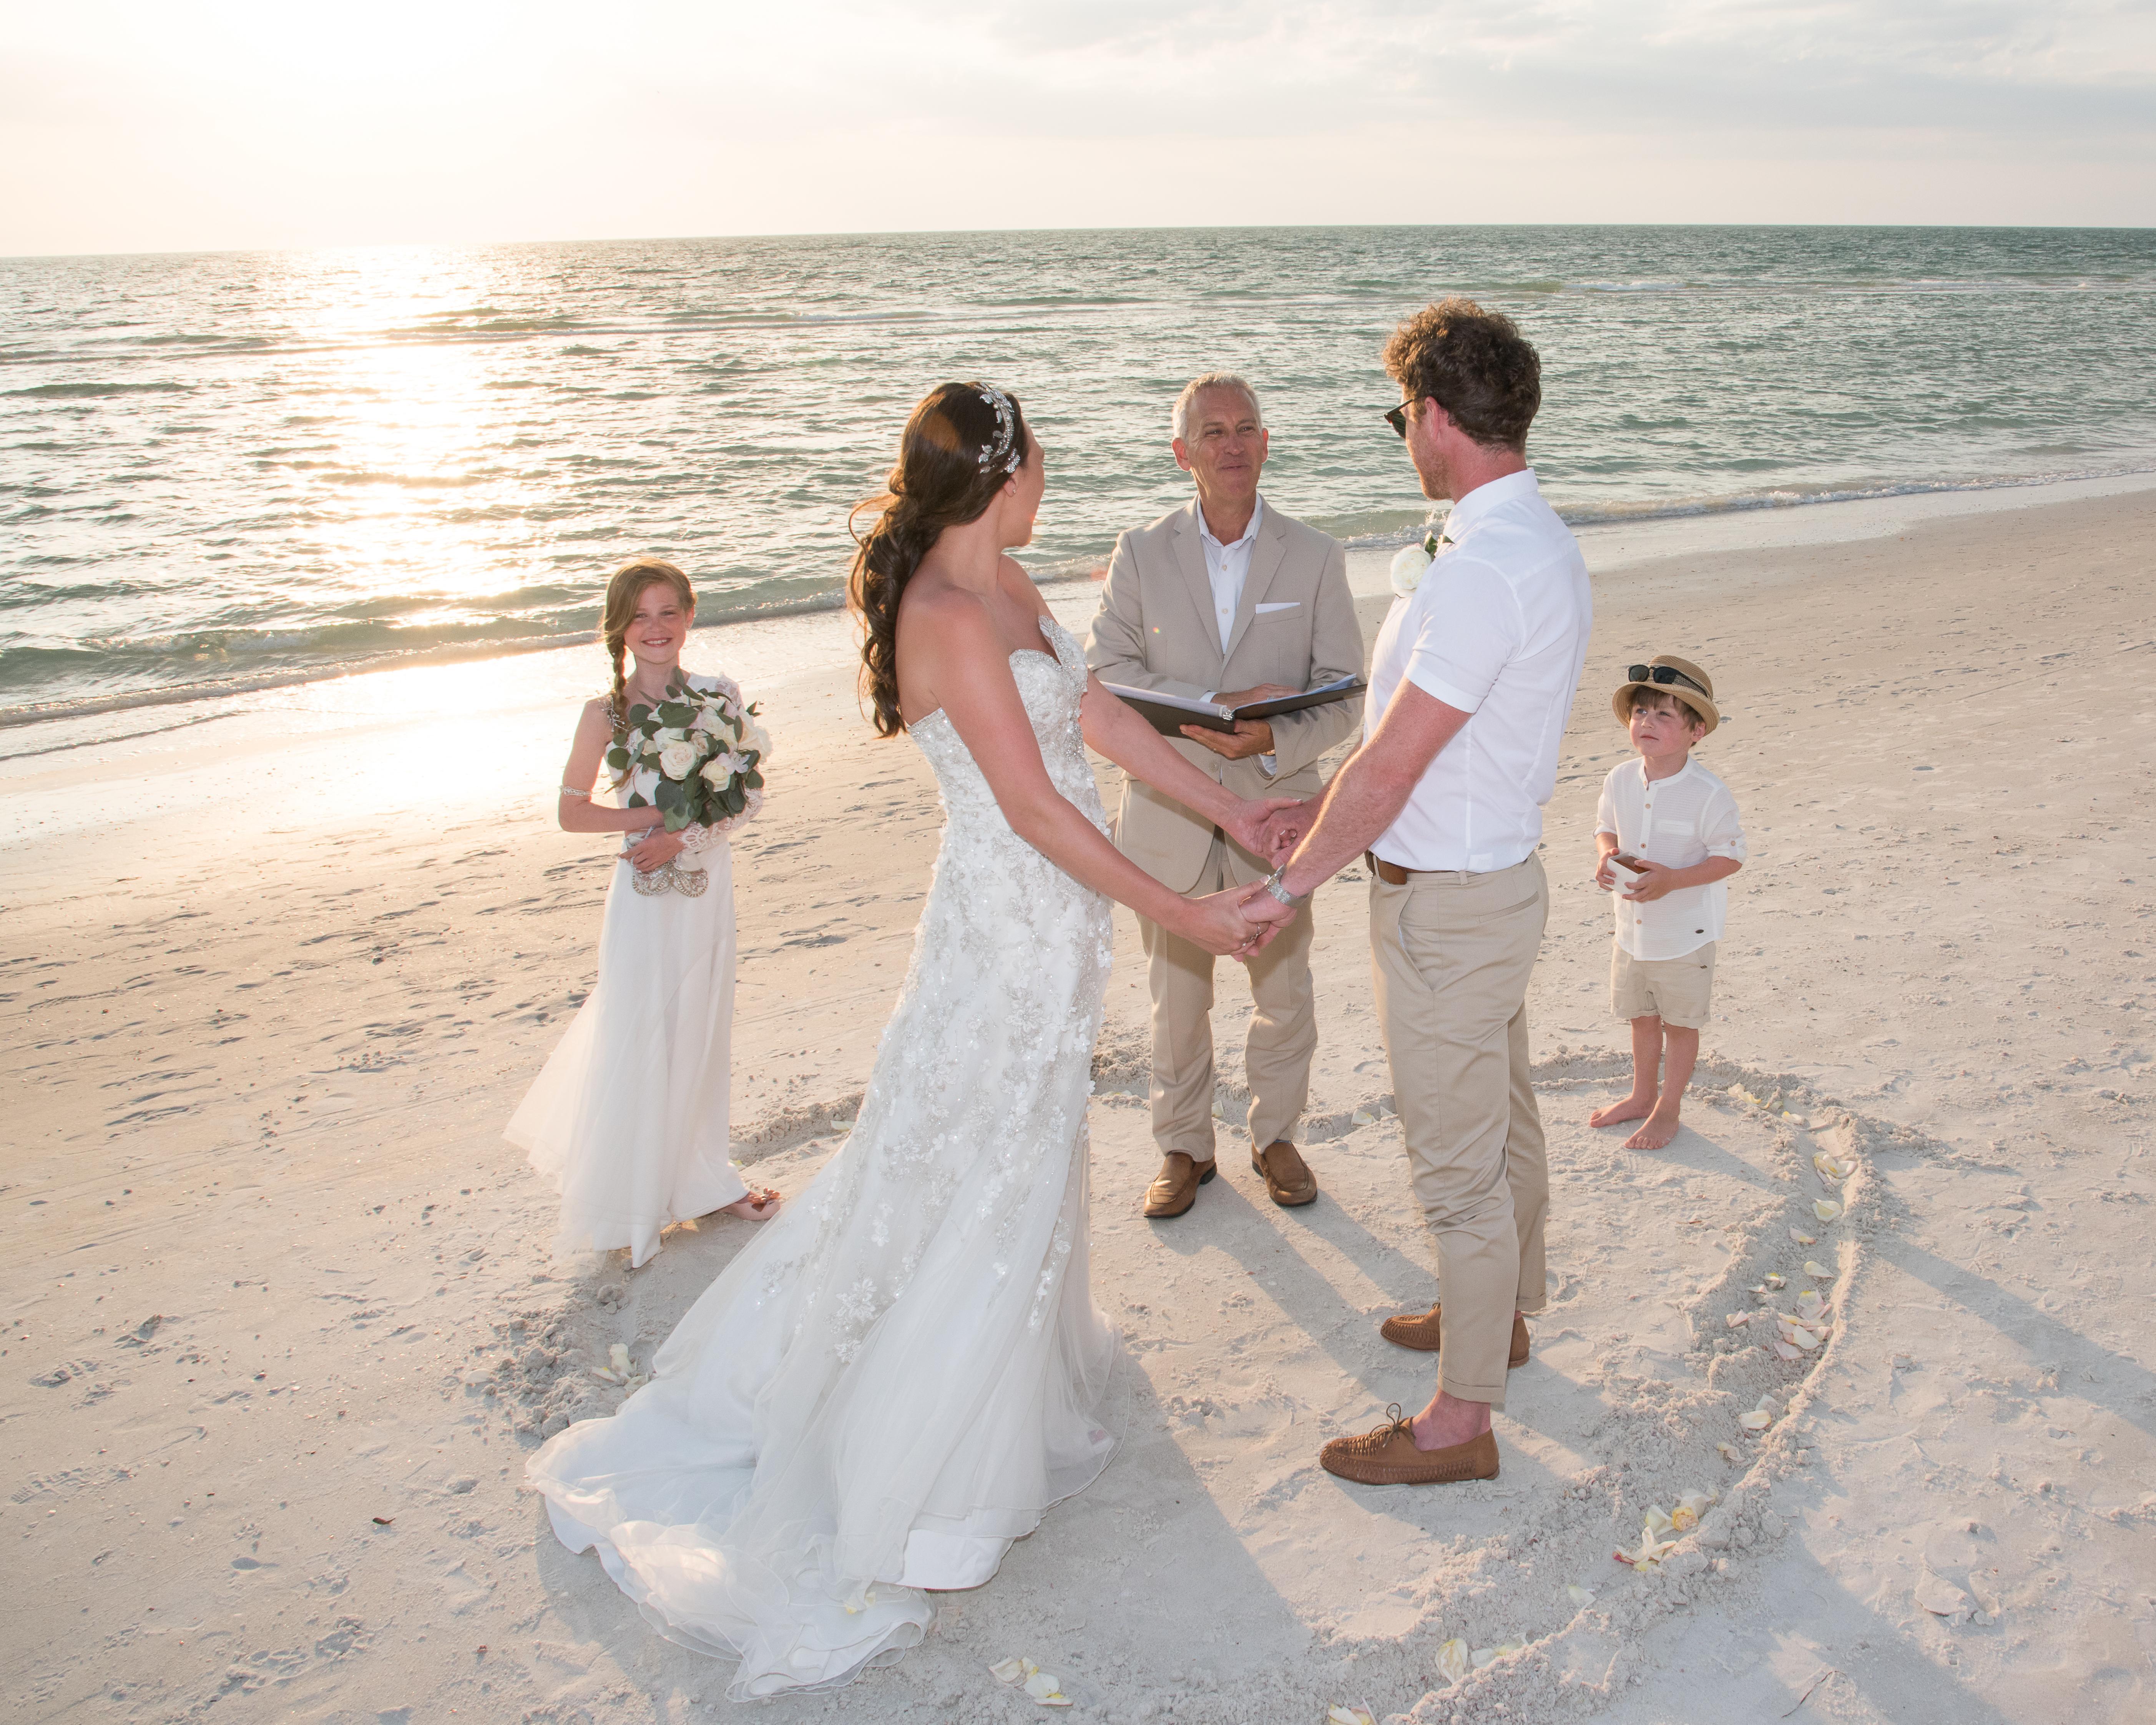 Wedding on Clearwater Beach, FL.